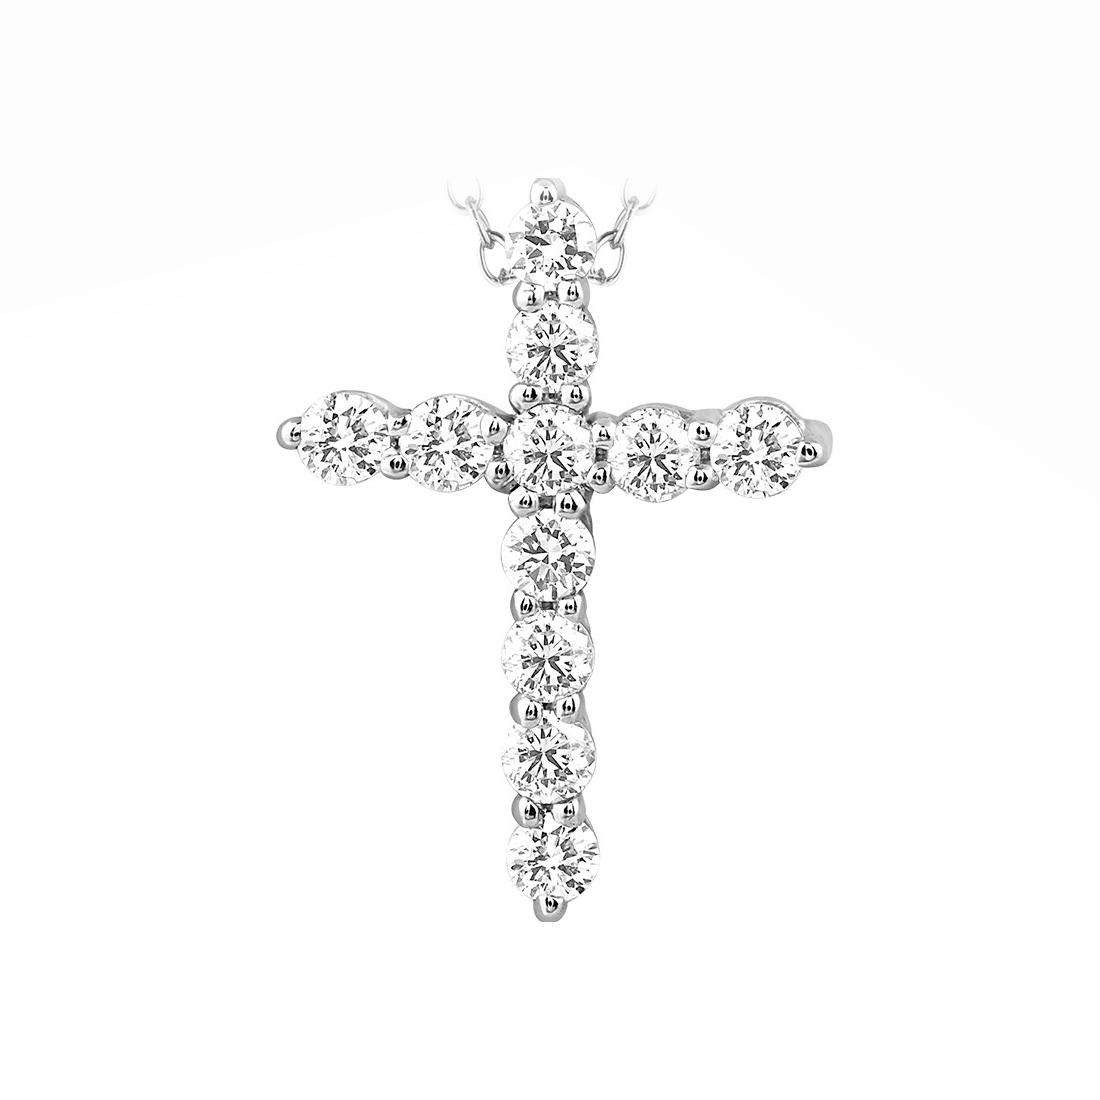 Paramount Gems 14 Karat White Gold .25 Carat Diamond Cross Necklace